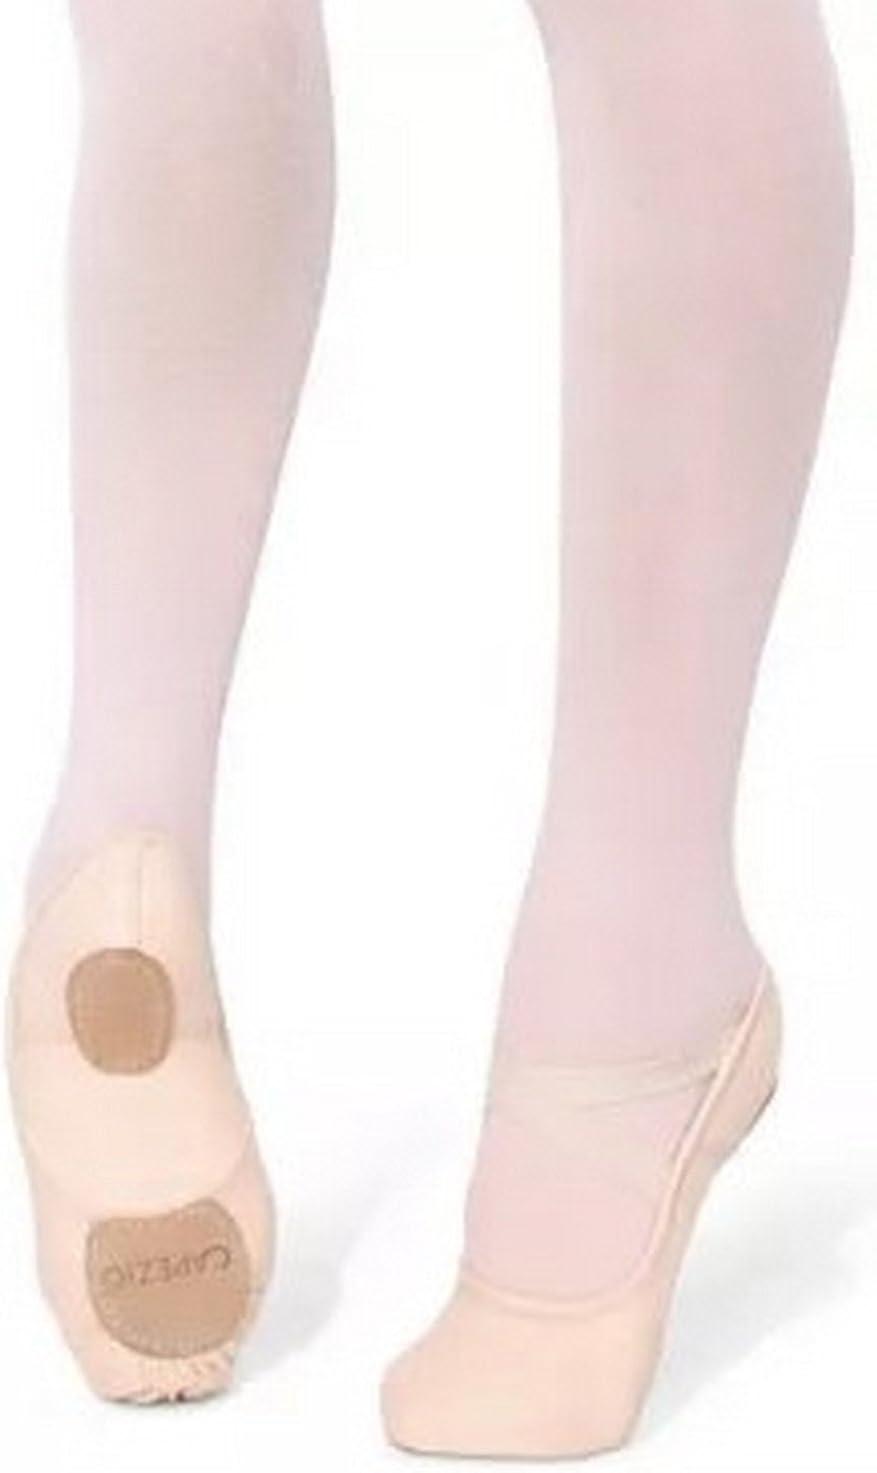 Capezio Womens Hanami Ballet Shoe Ranking TOP9 -10 New popularity -LIGHT 2037W PINK